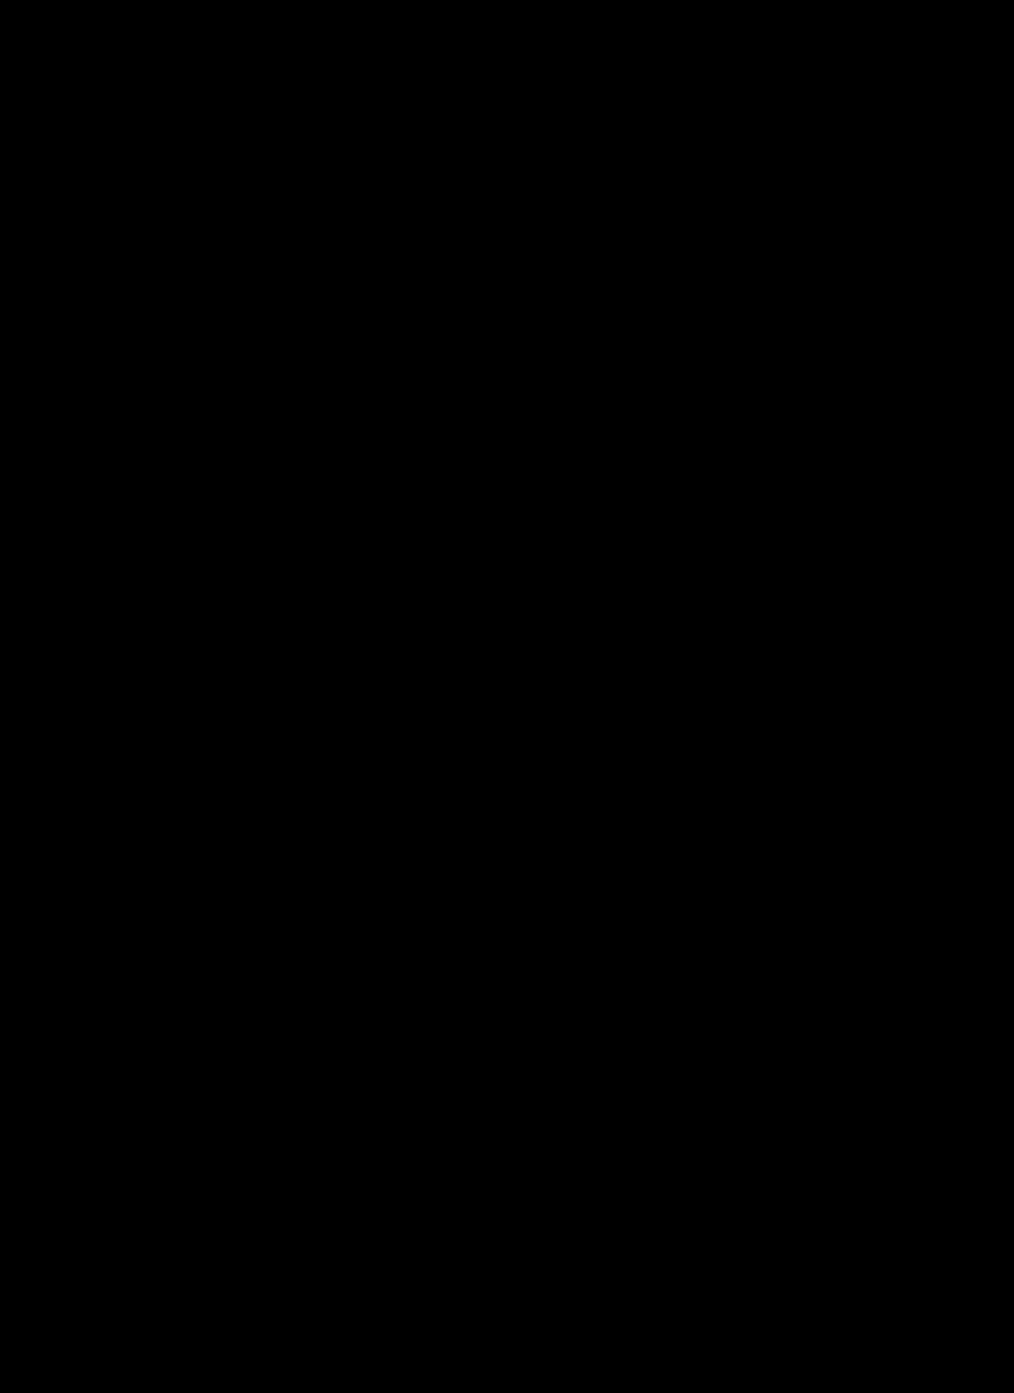 SXSW_Stack_RGB.png